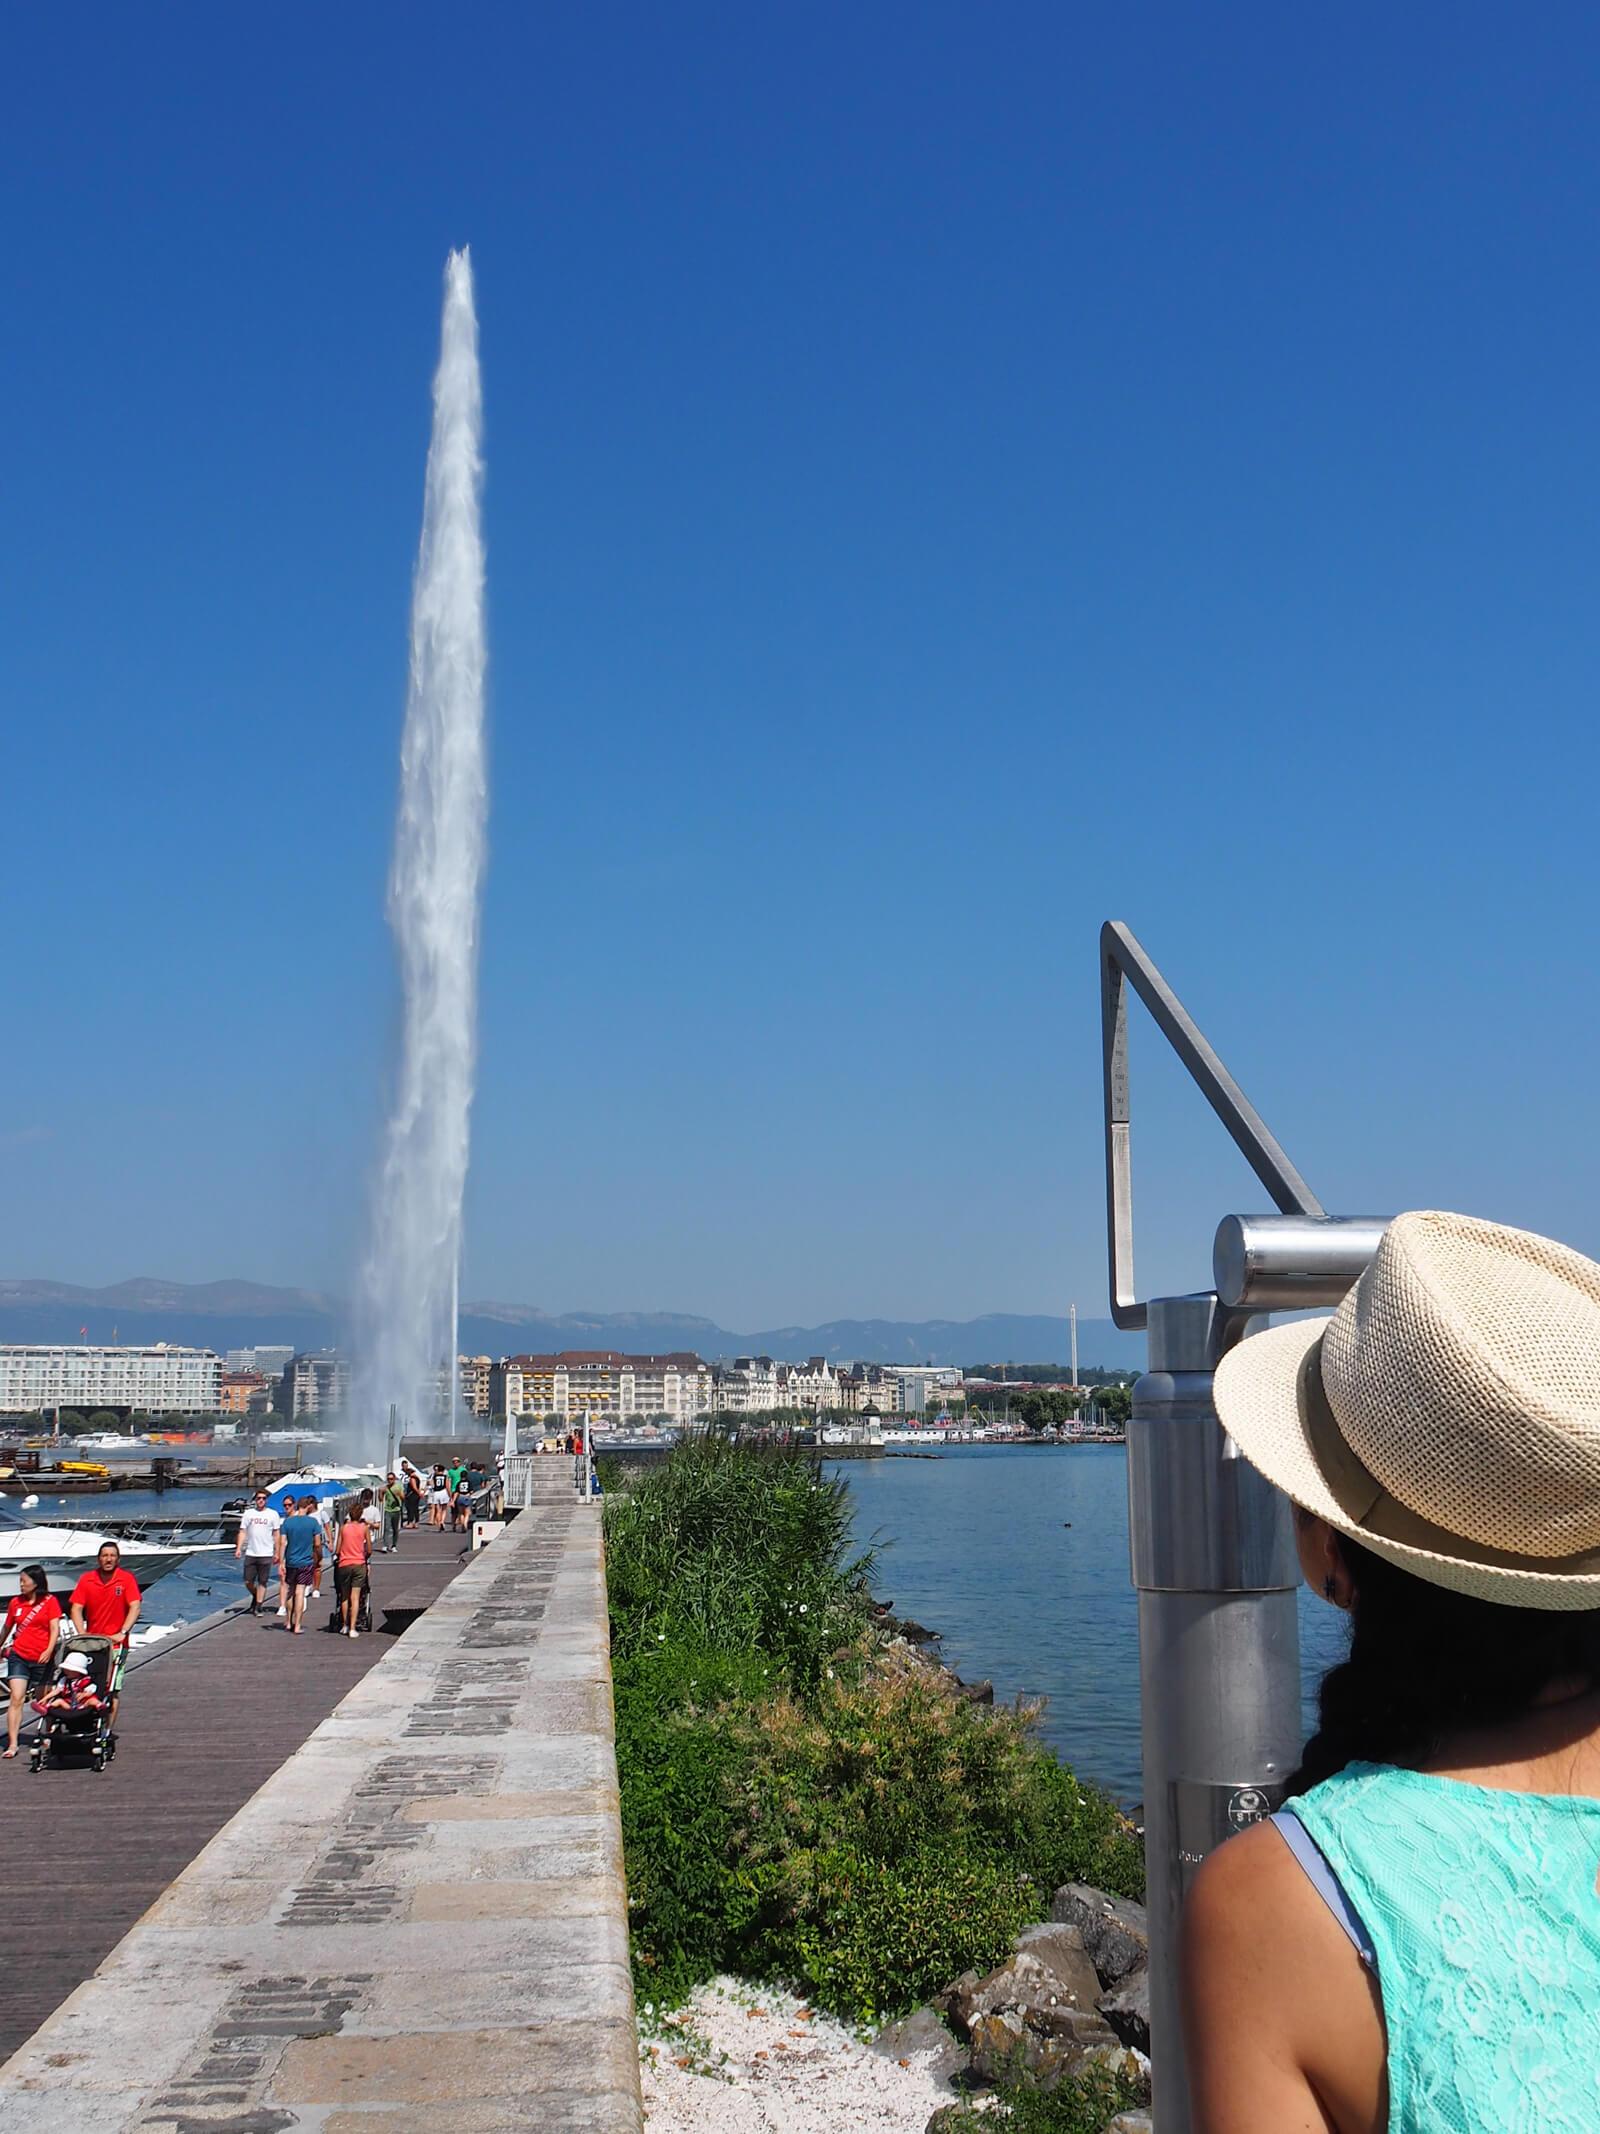 Jet d'Eau Water Fountain in Geneva, Switzerland